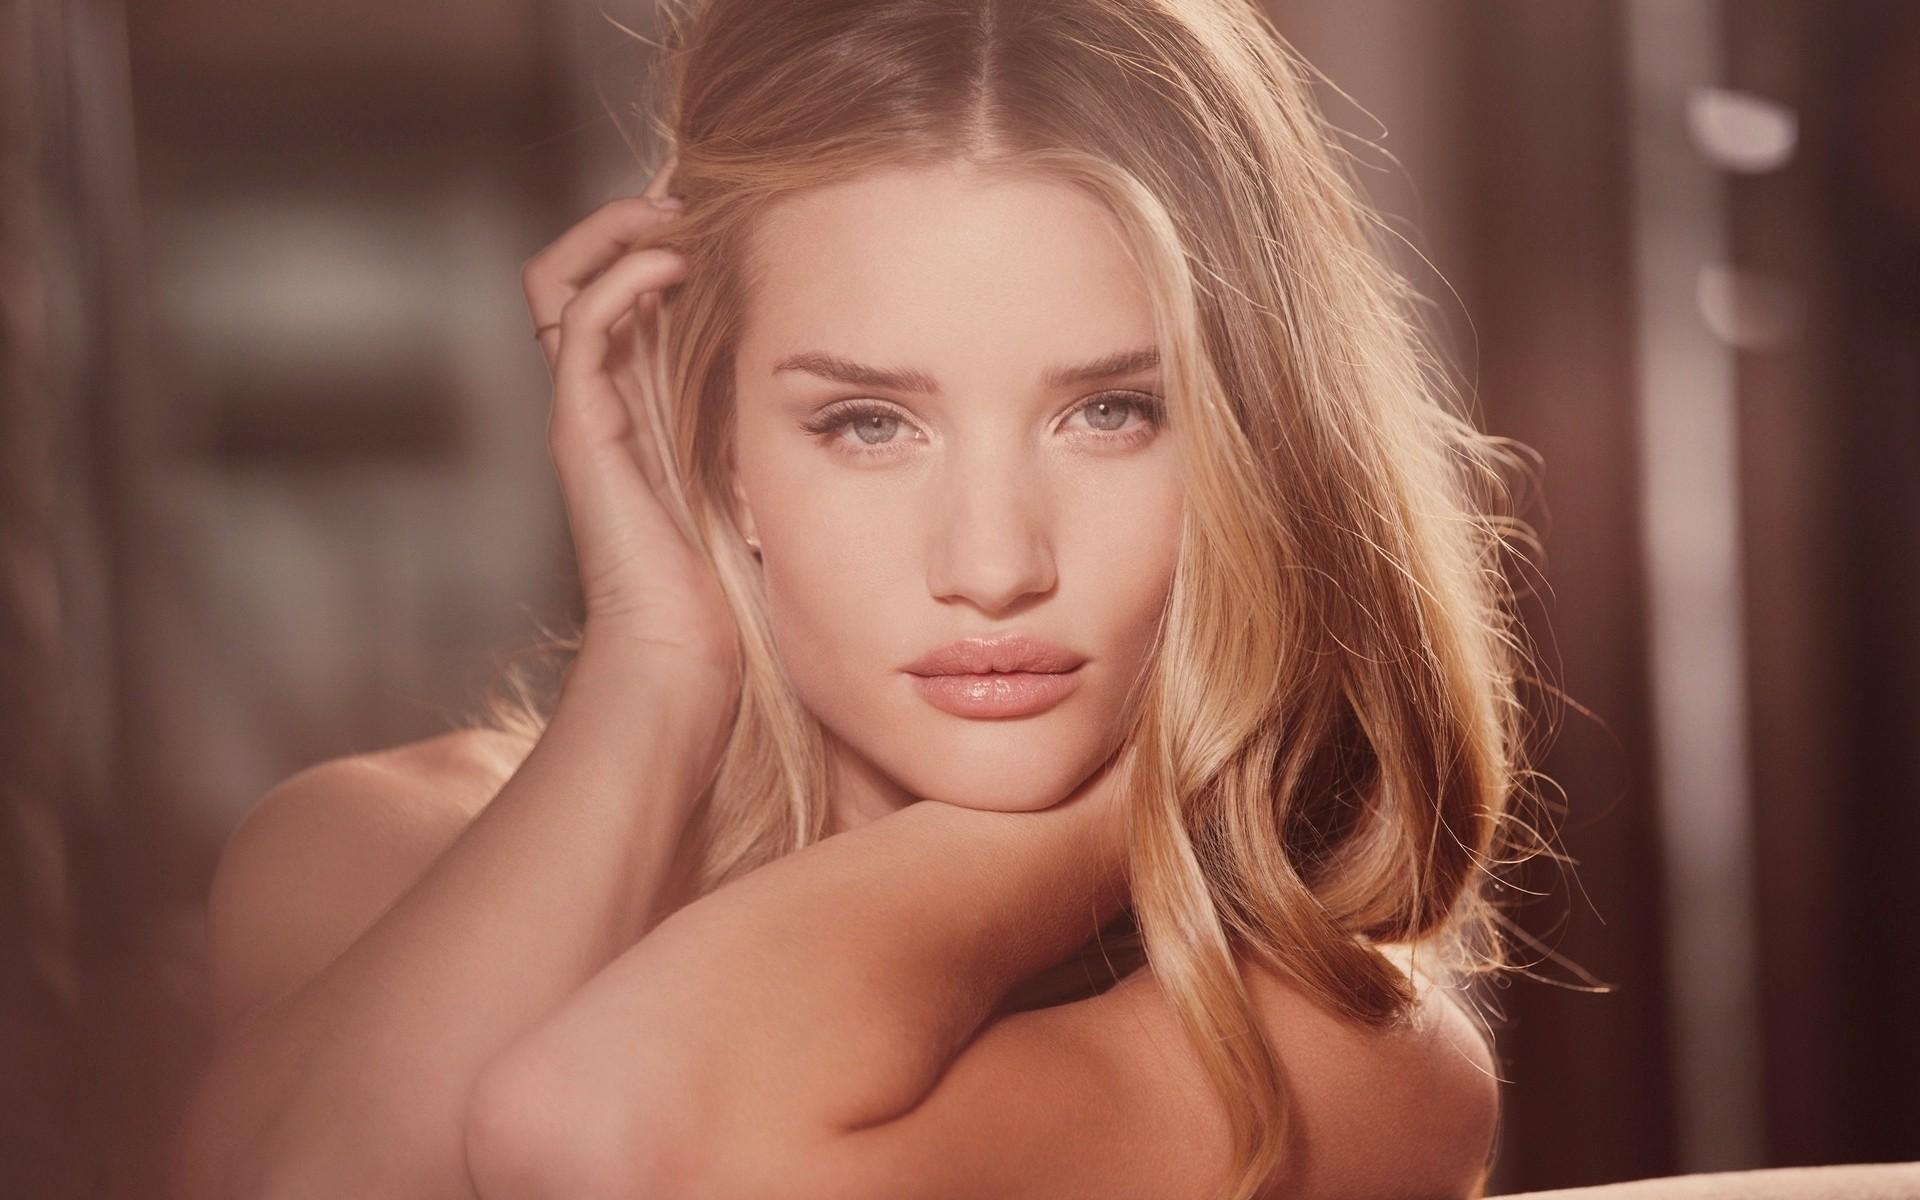 People 1920x1200 Rosie Huntington-Whiteley women face blonde lips model